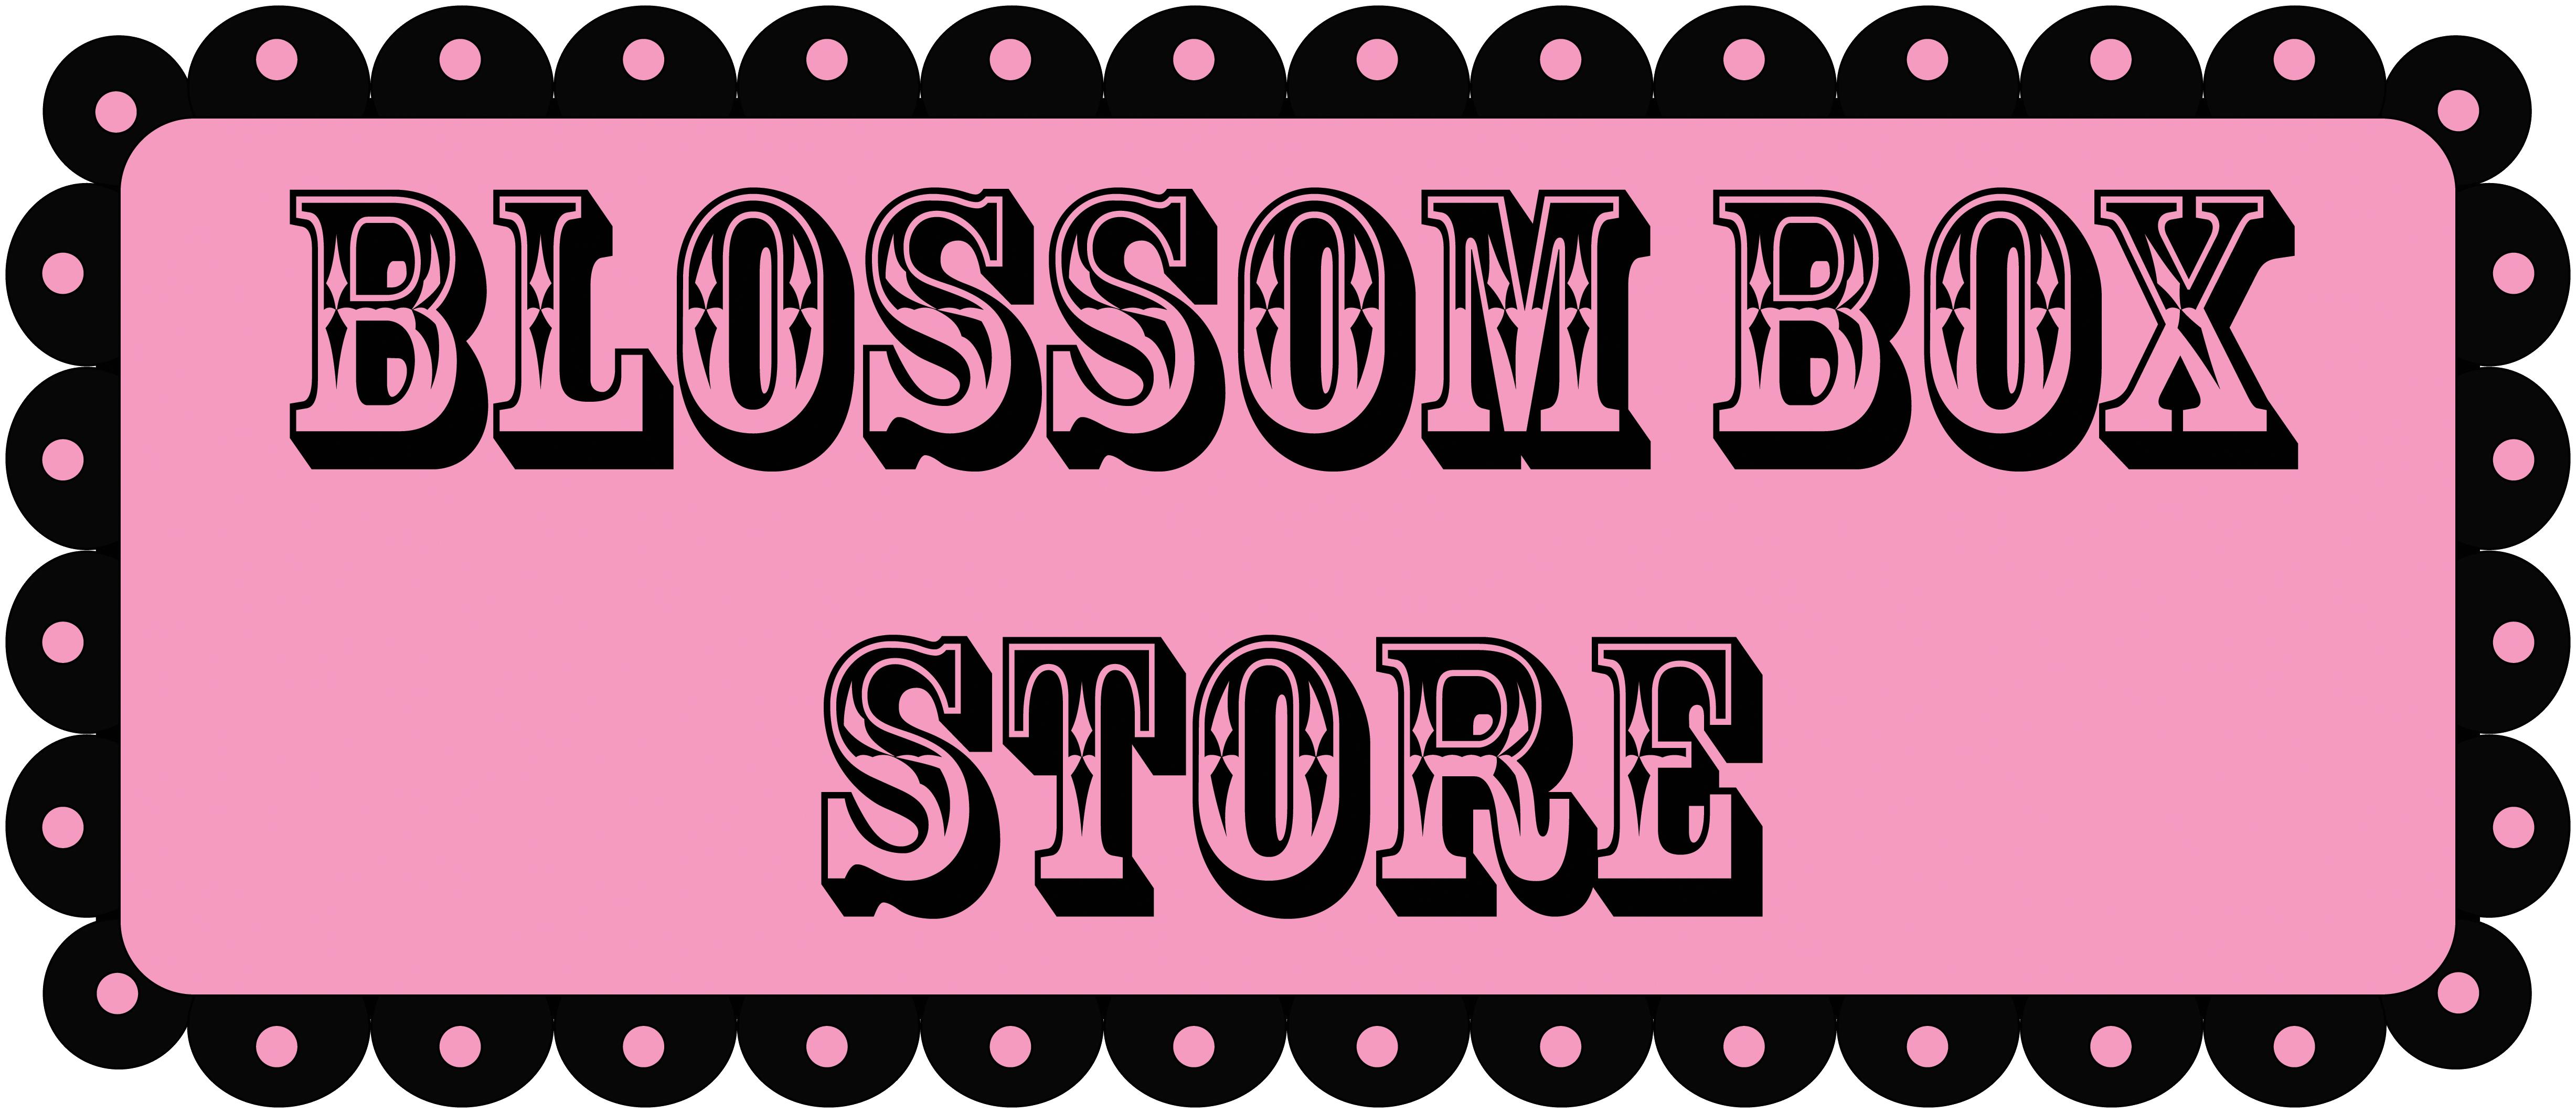 Blossom Box Store